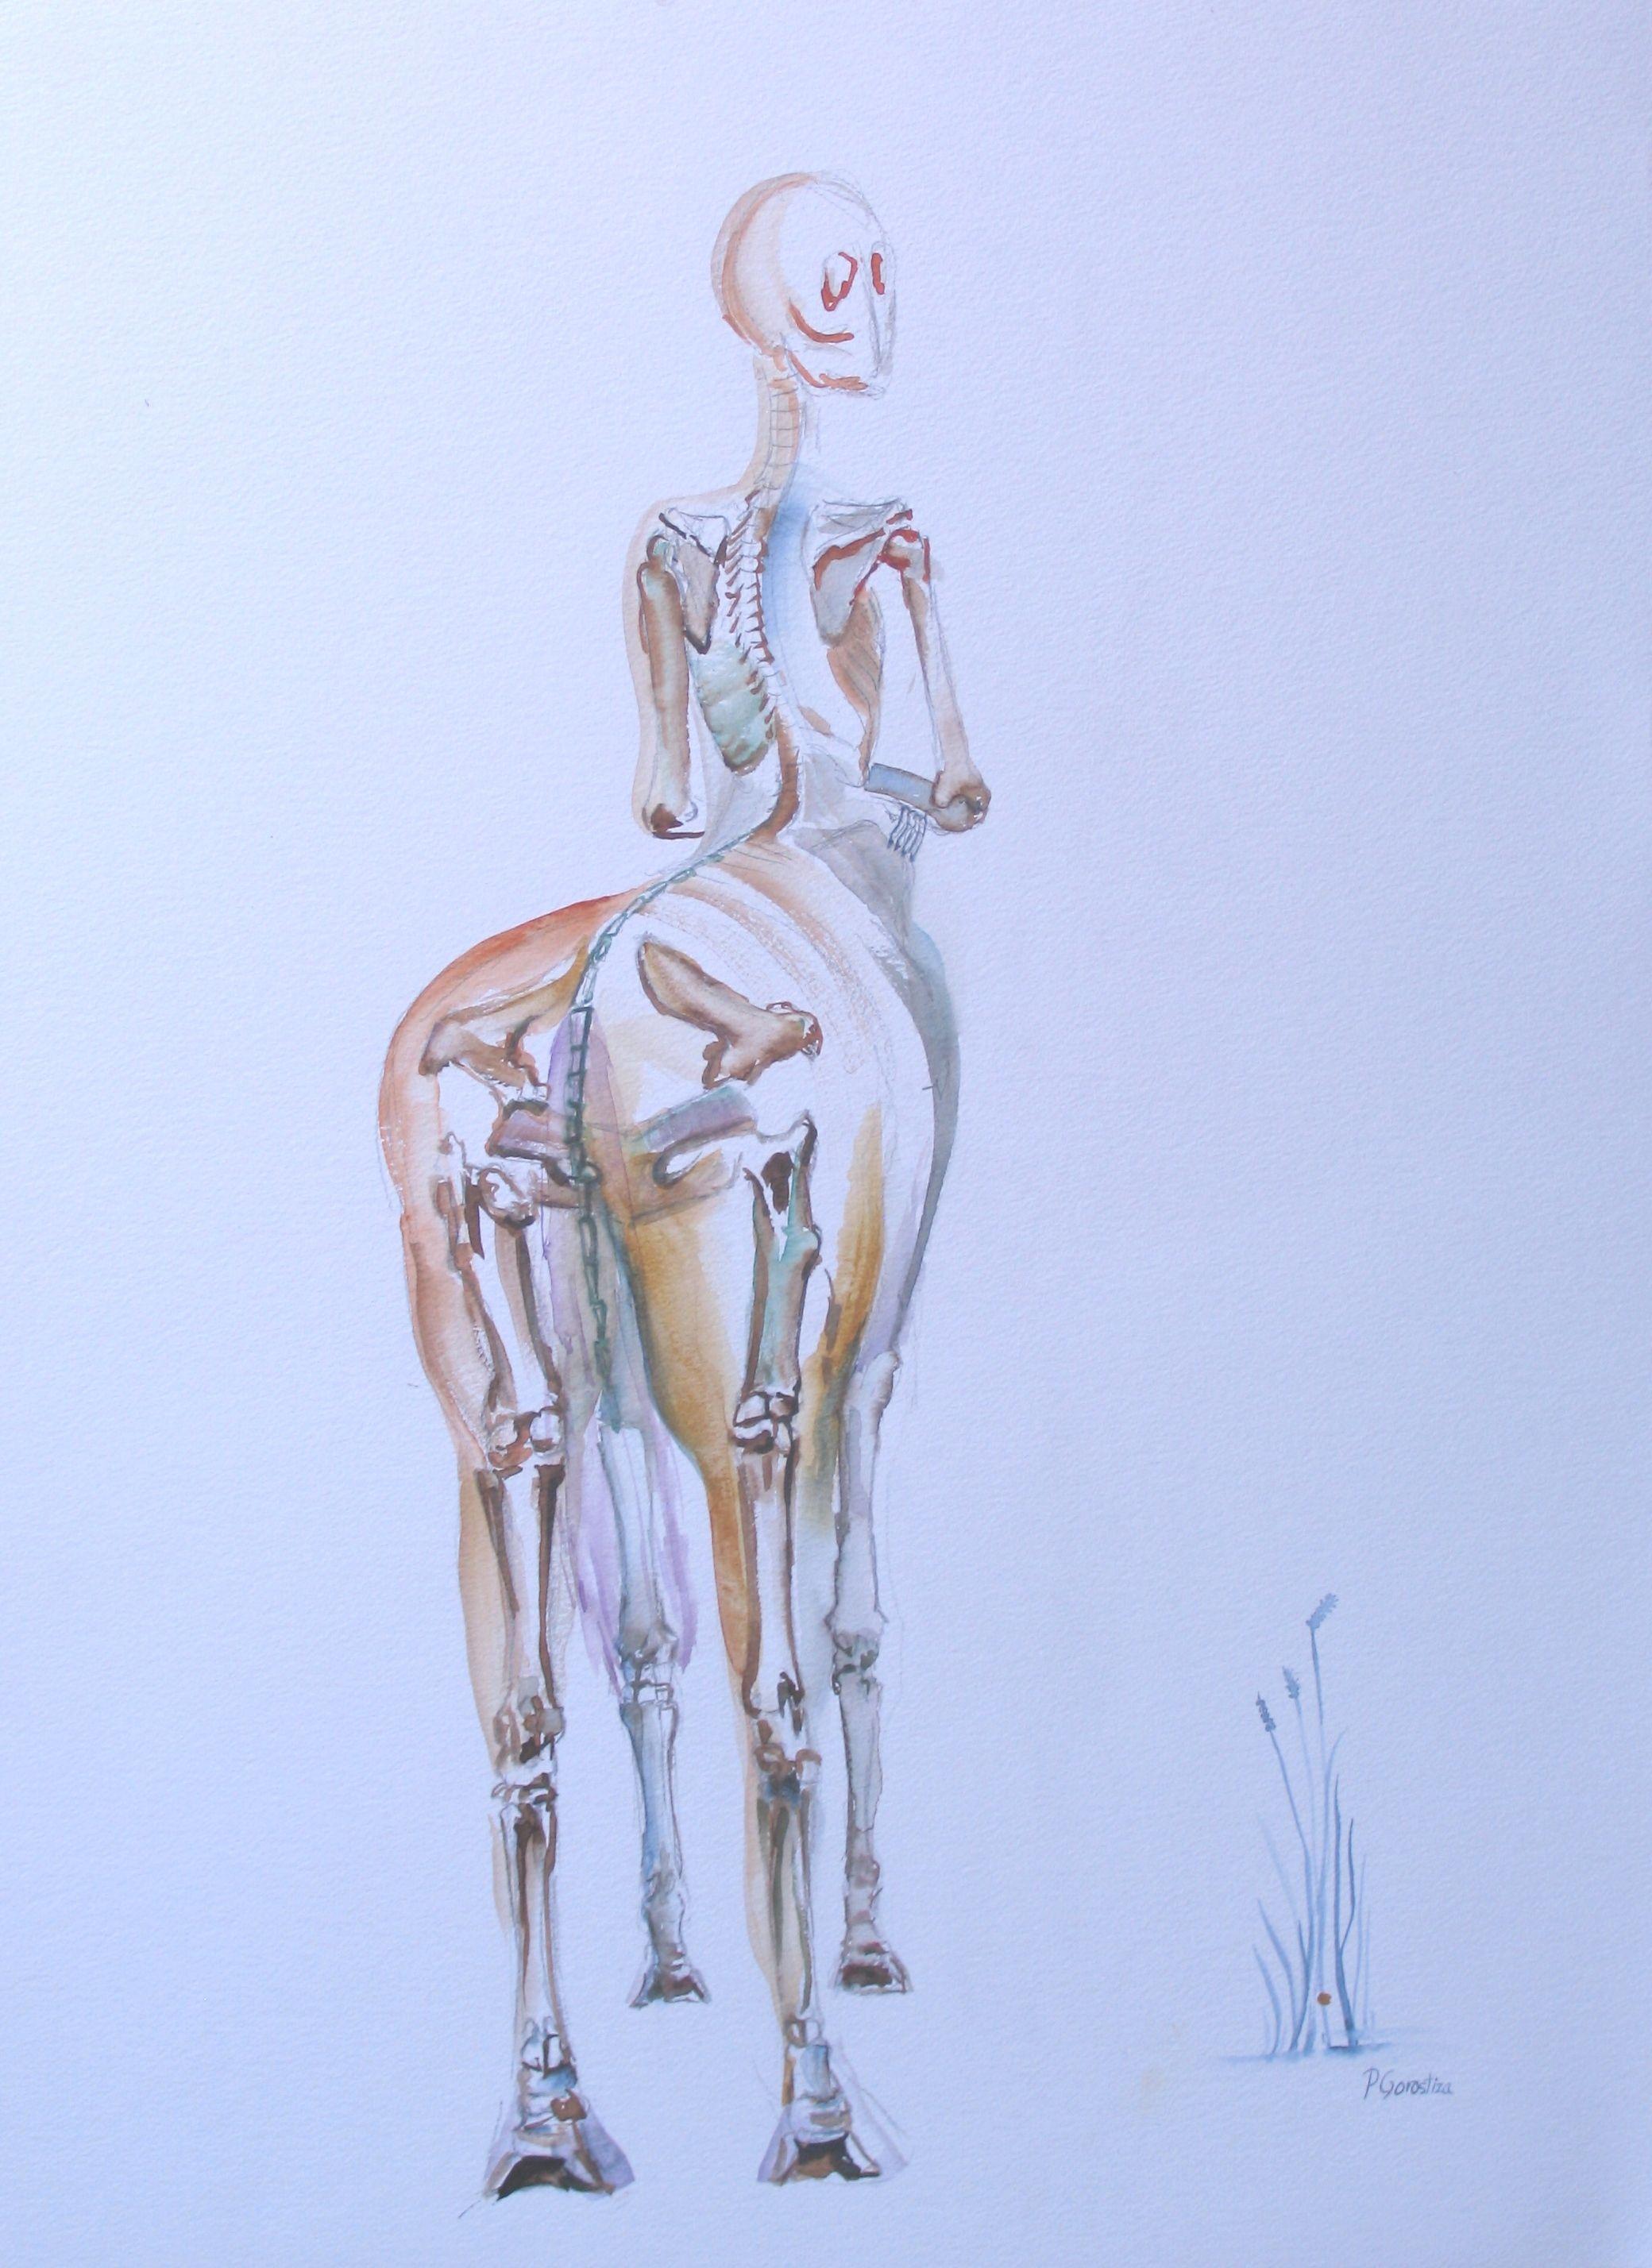 Metamorfosis #acuarela #watercolor #art #arte #canvas #artesanal #hechoamano #artisan #artist #catrina